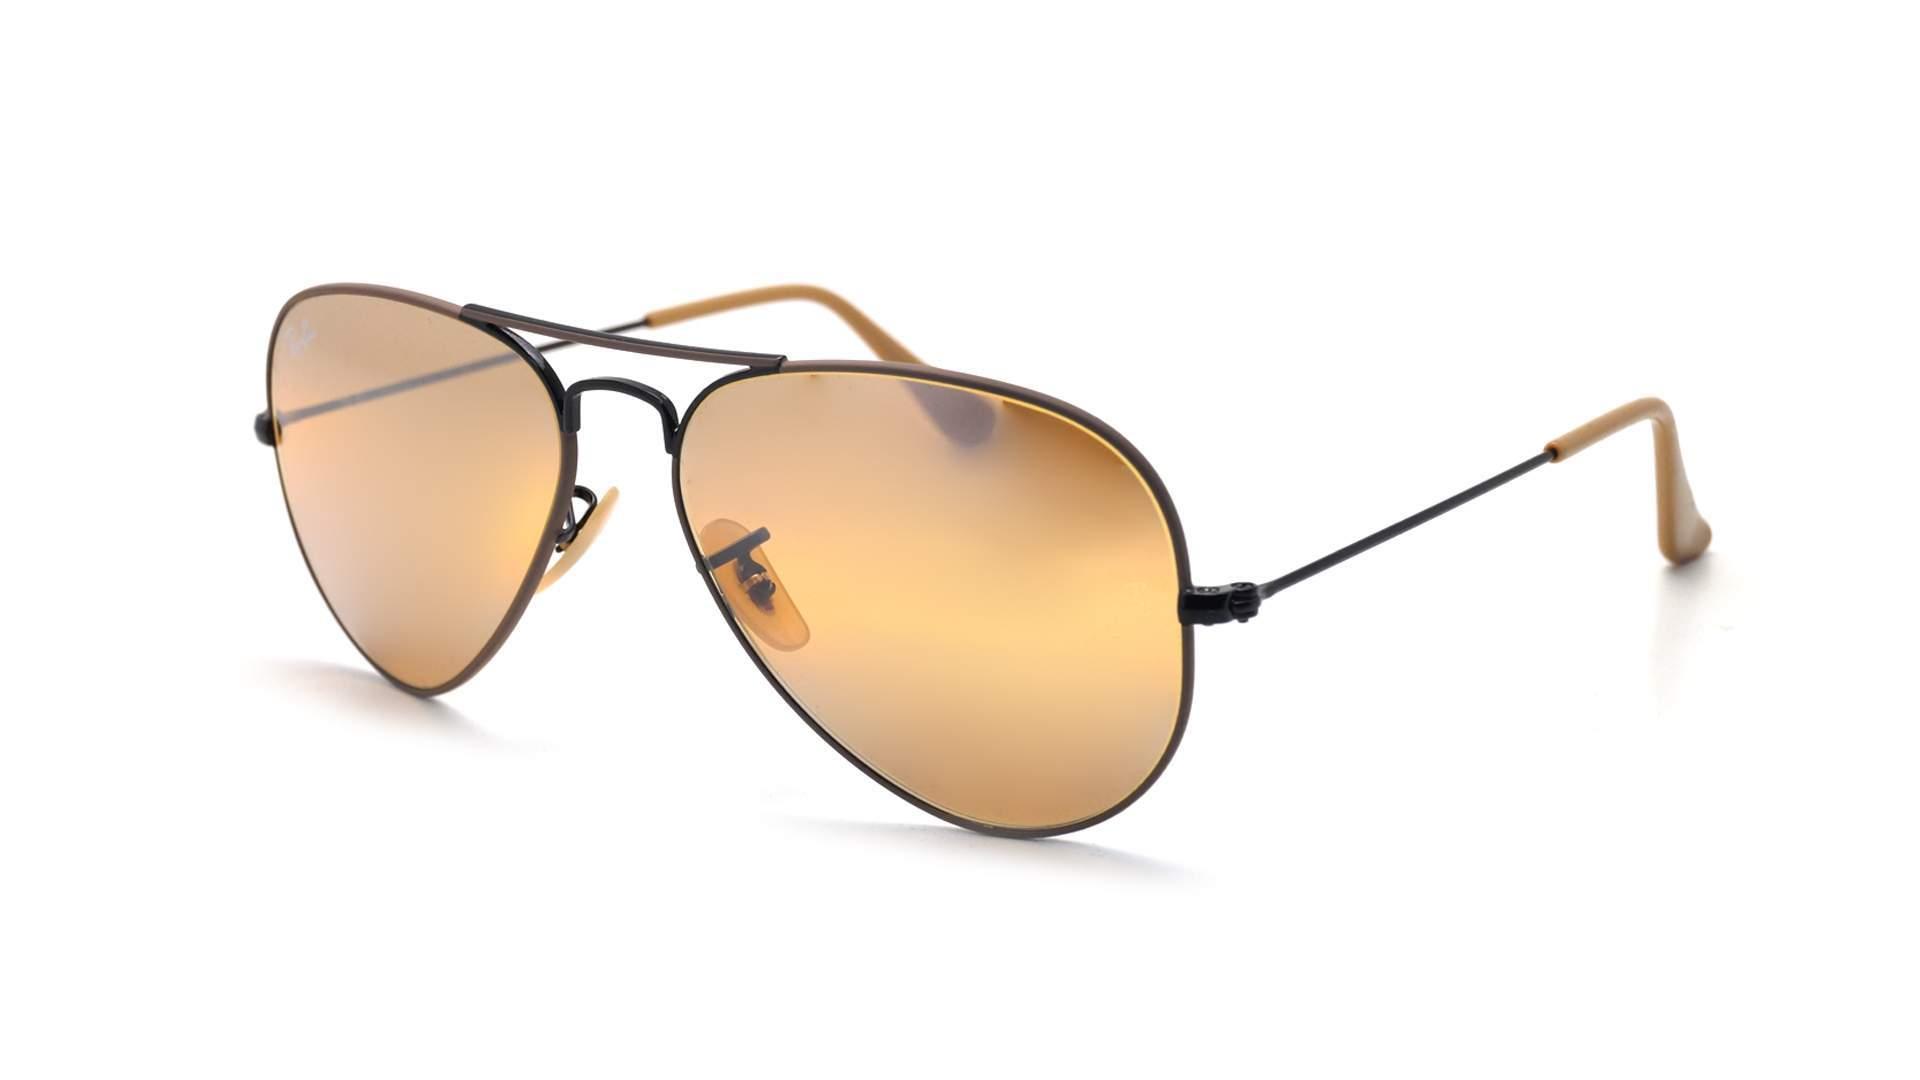 535b5cdb939cc Sunglasses Ray-Ban Aviator Mirror Beige Mat RB3025 9153 AG 58-14 Medium  Gradient Flash